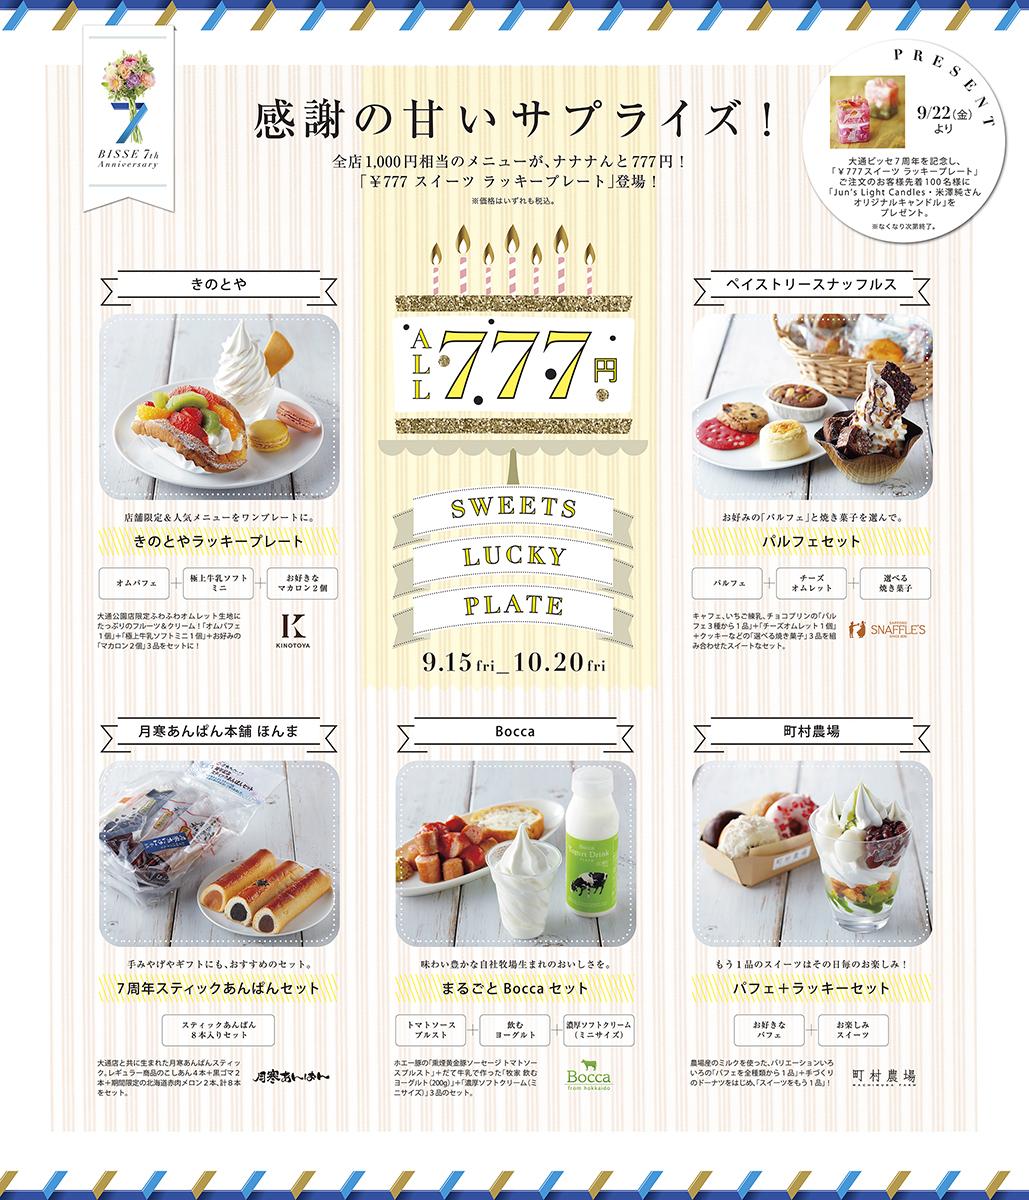 http://www.odori-bisse.com/info/up_images/news_170914_img02.jpg